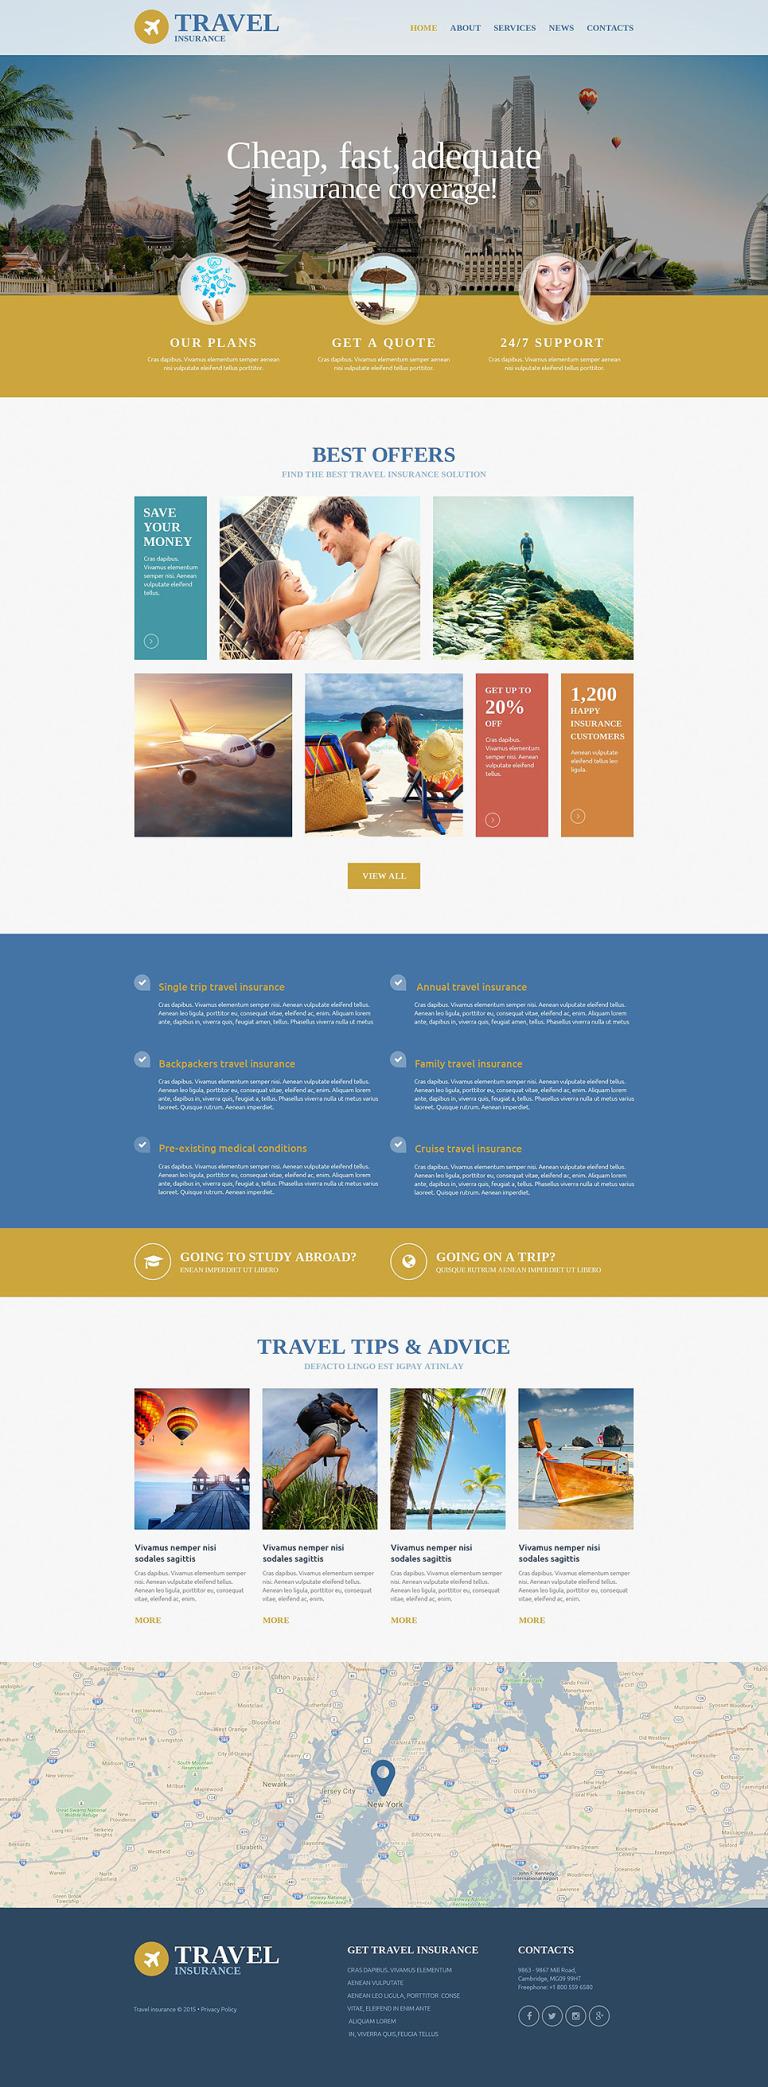 Travel Insurance Agency Website Template New Screenshots BIG